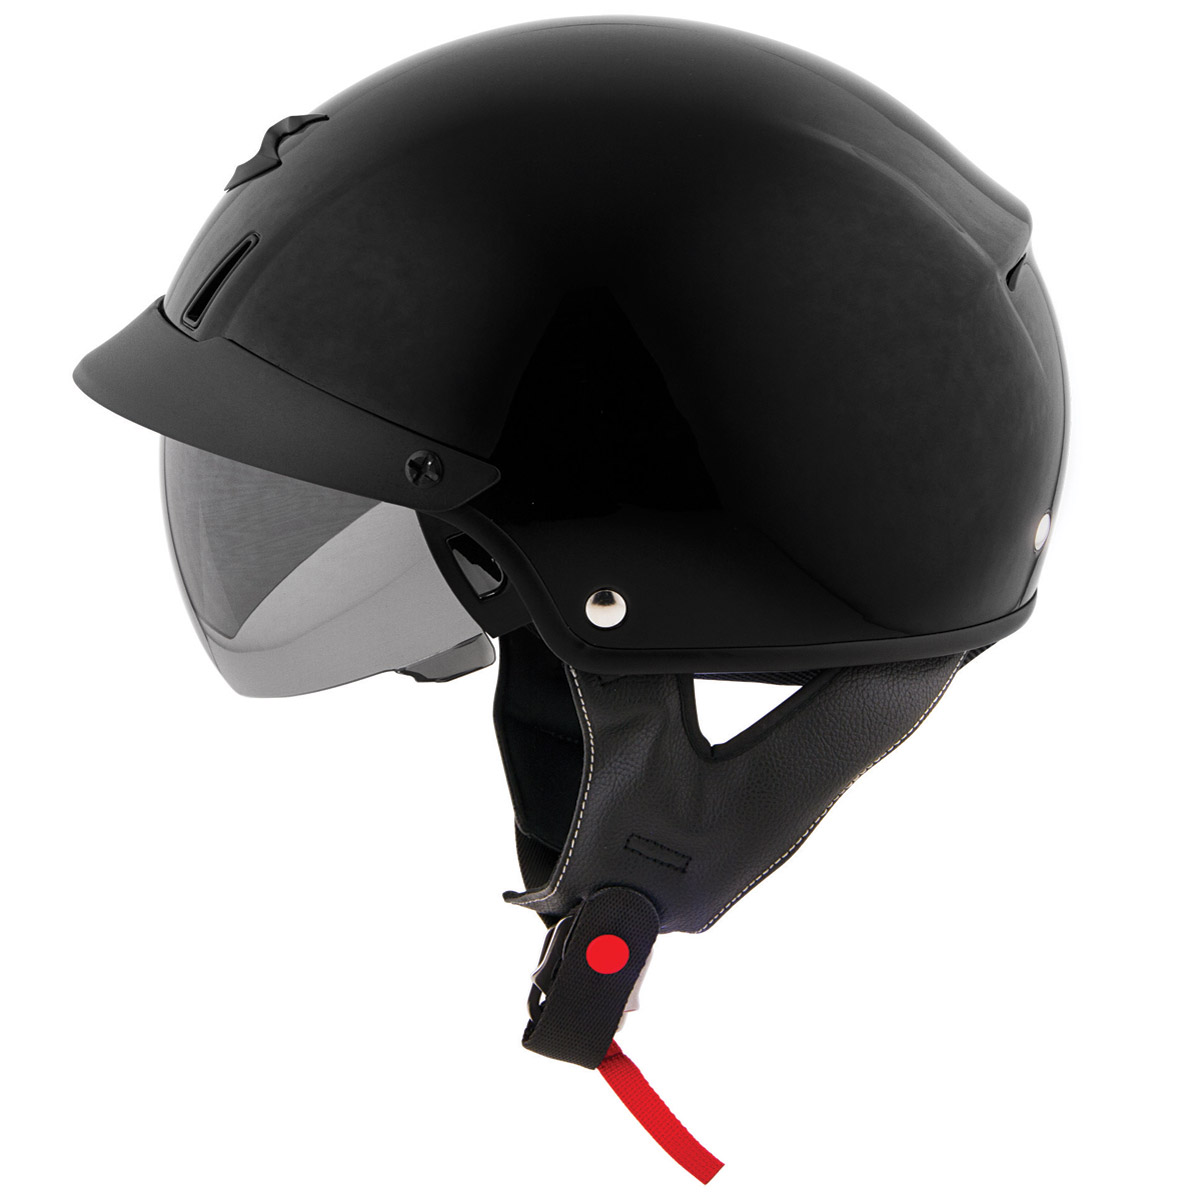 scorpion exo c110 half helmet ebay. Black Bedroom Furniture Sets. Home Design Ideas